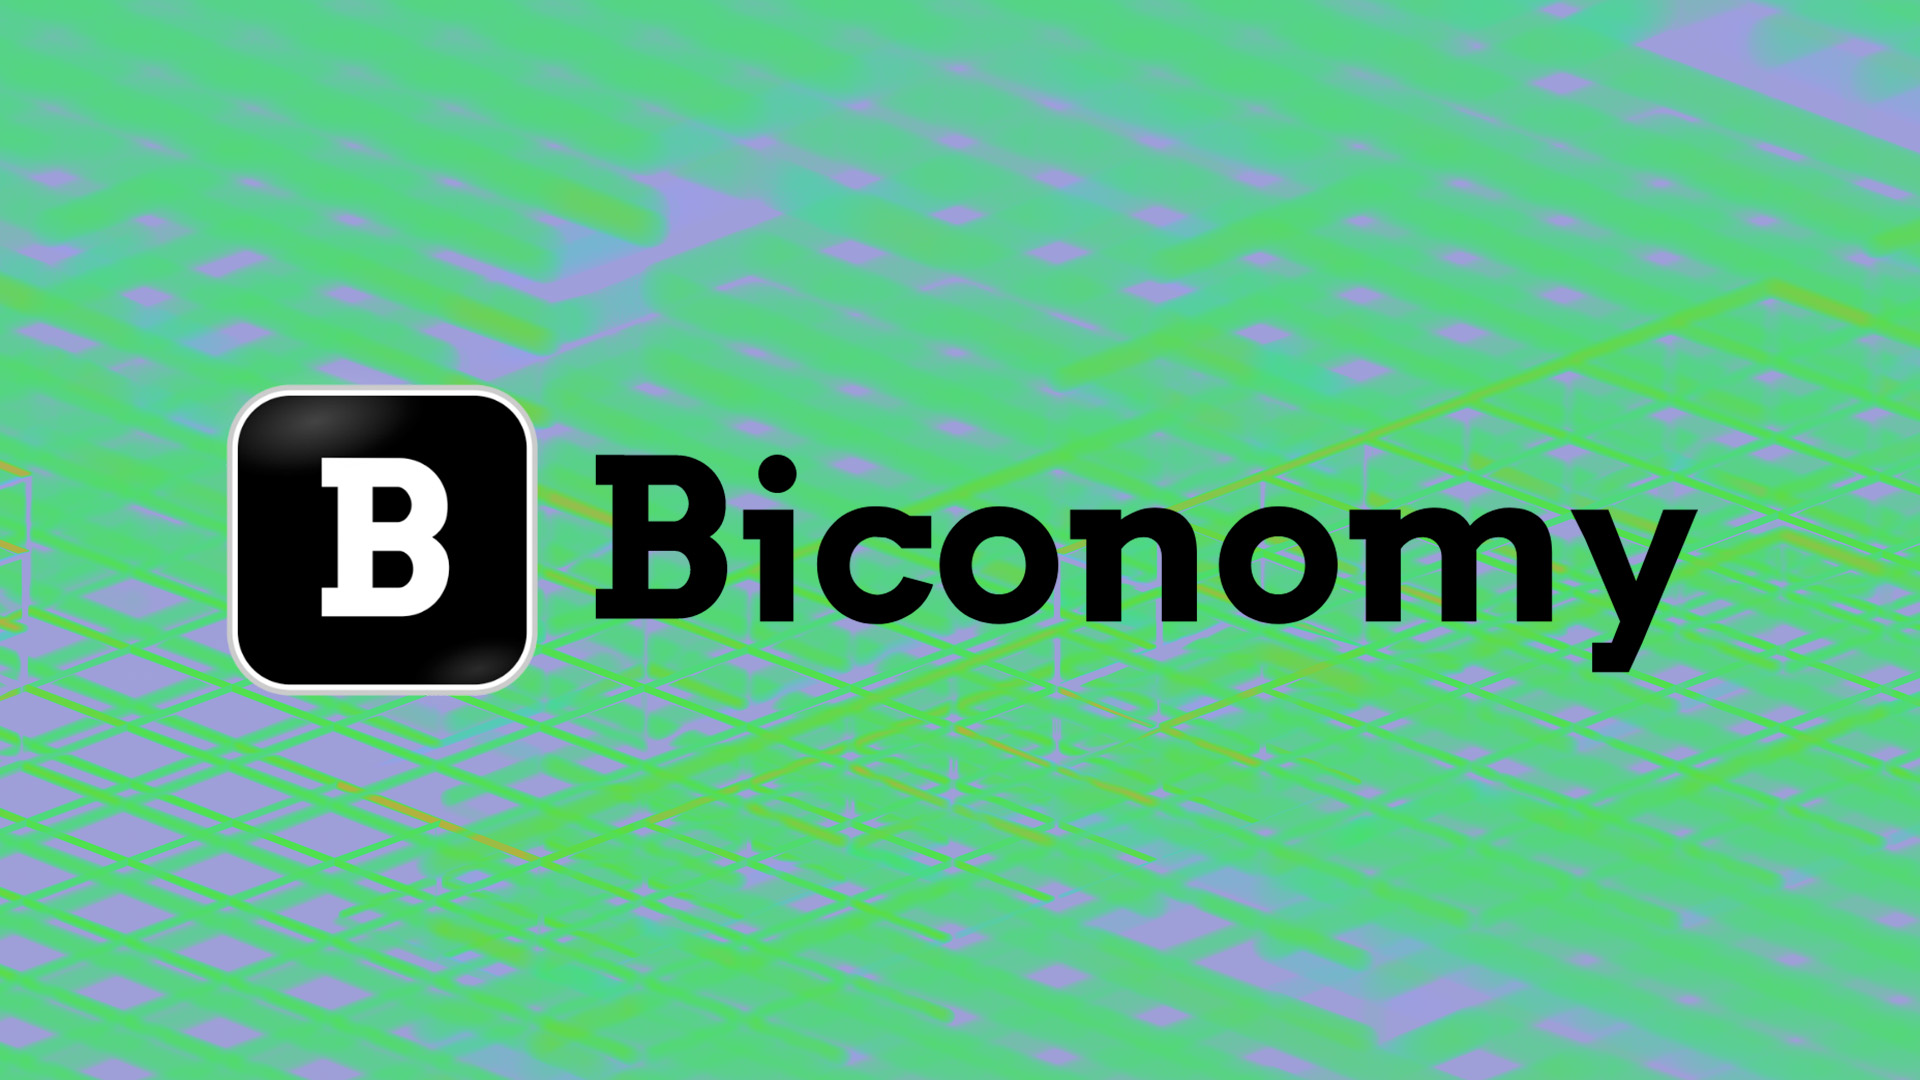 Blockchain infrastructure provider Biconomy raises $9 million in SAFT funding